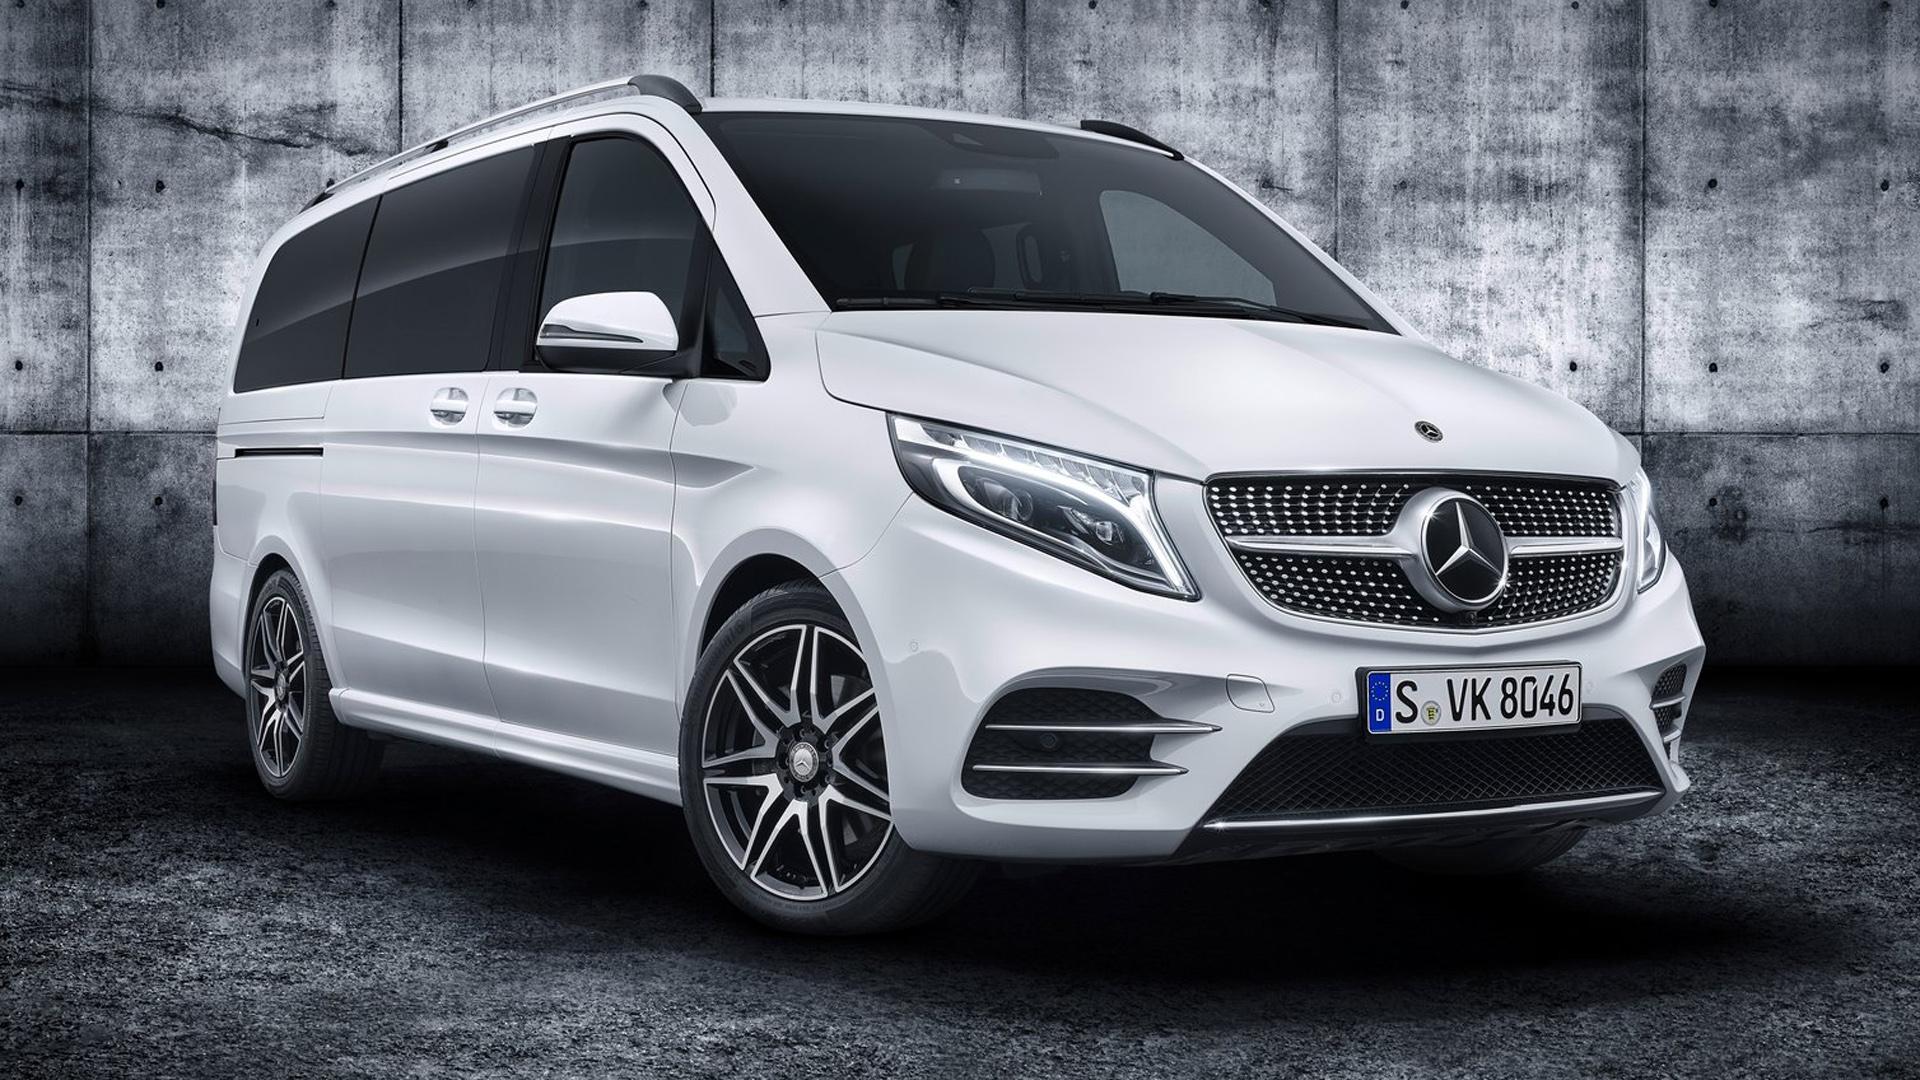 Mercedes-Benz V-Class 2019